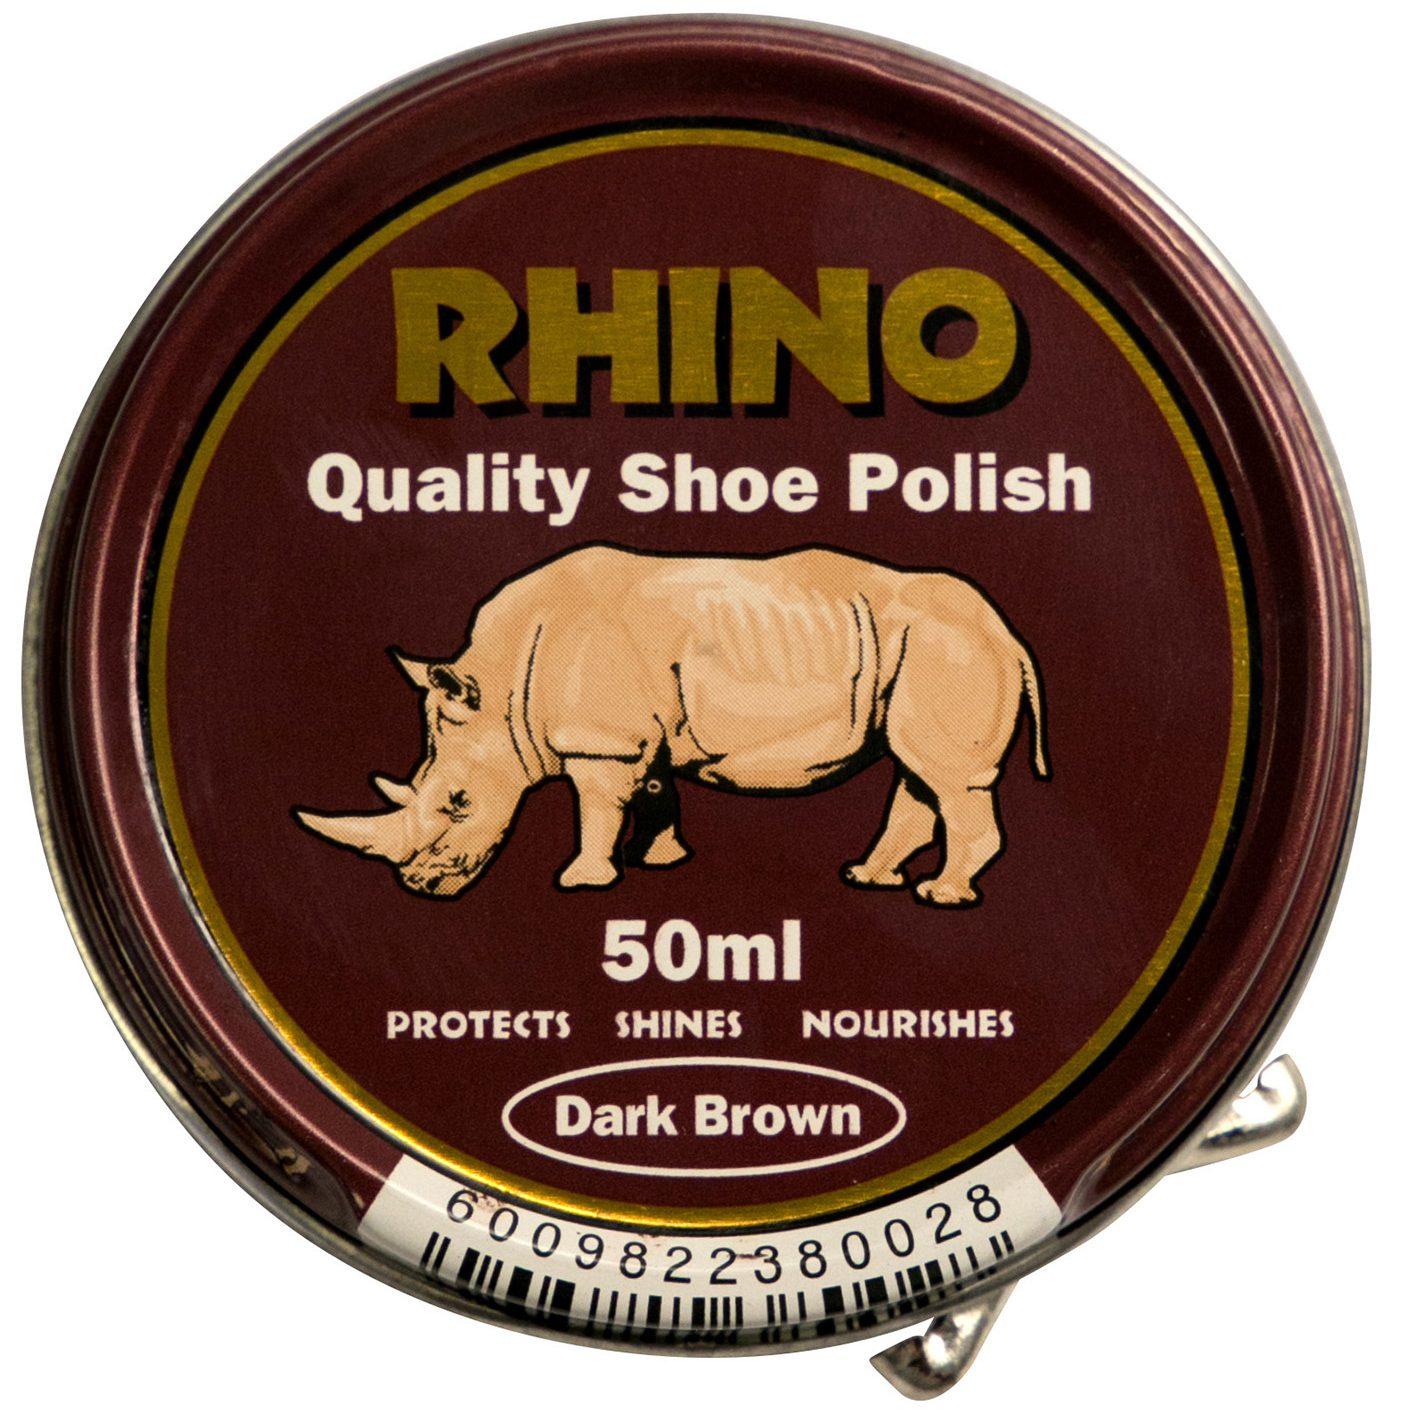 Rhino Shoe Polish Dark Brown 50ml